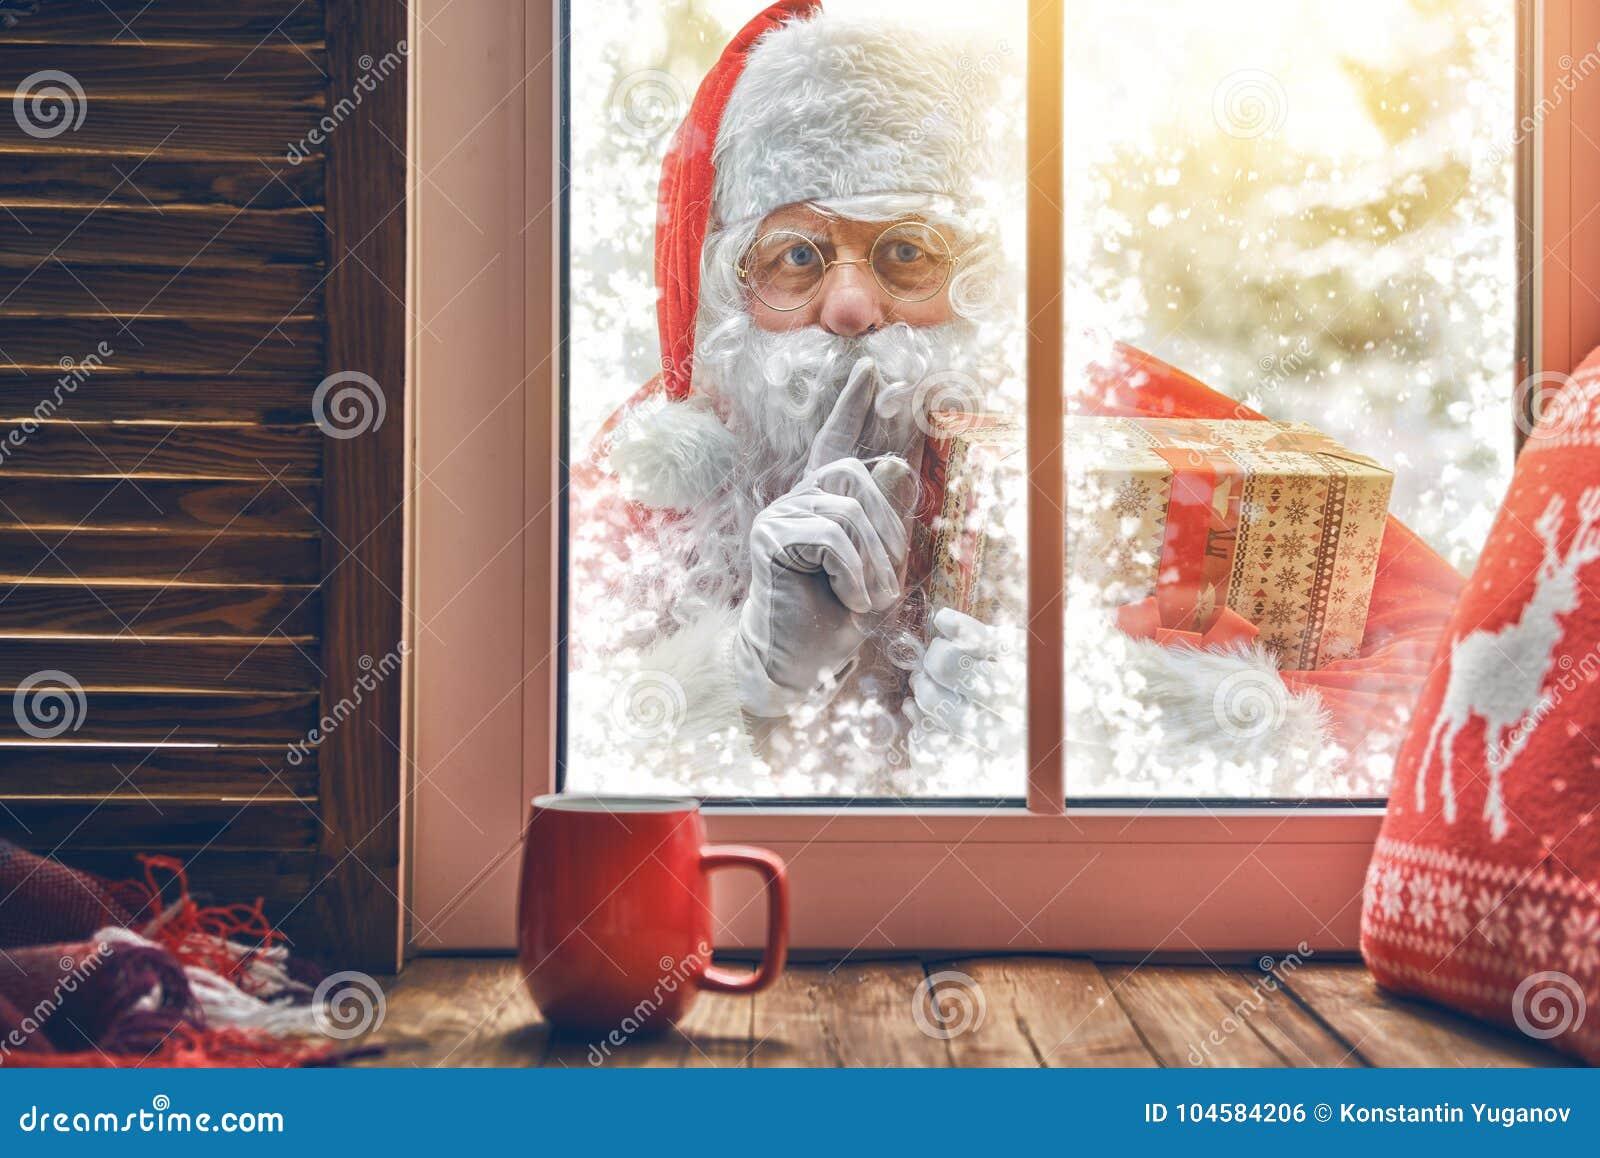 Santa Claus está batendo na janela